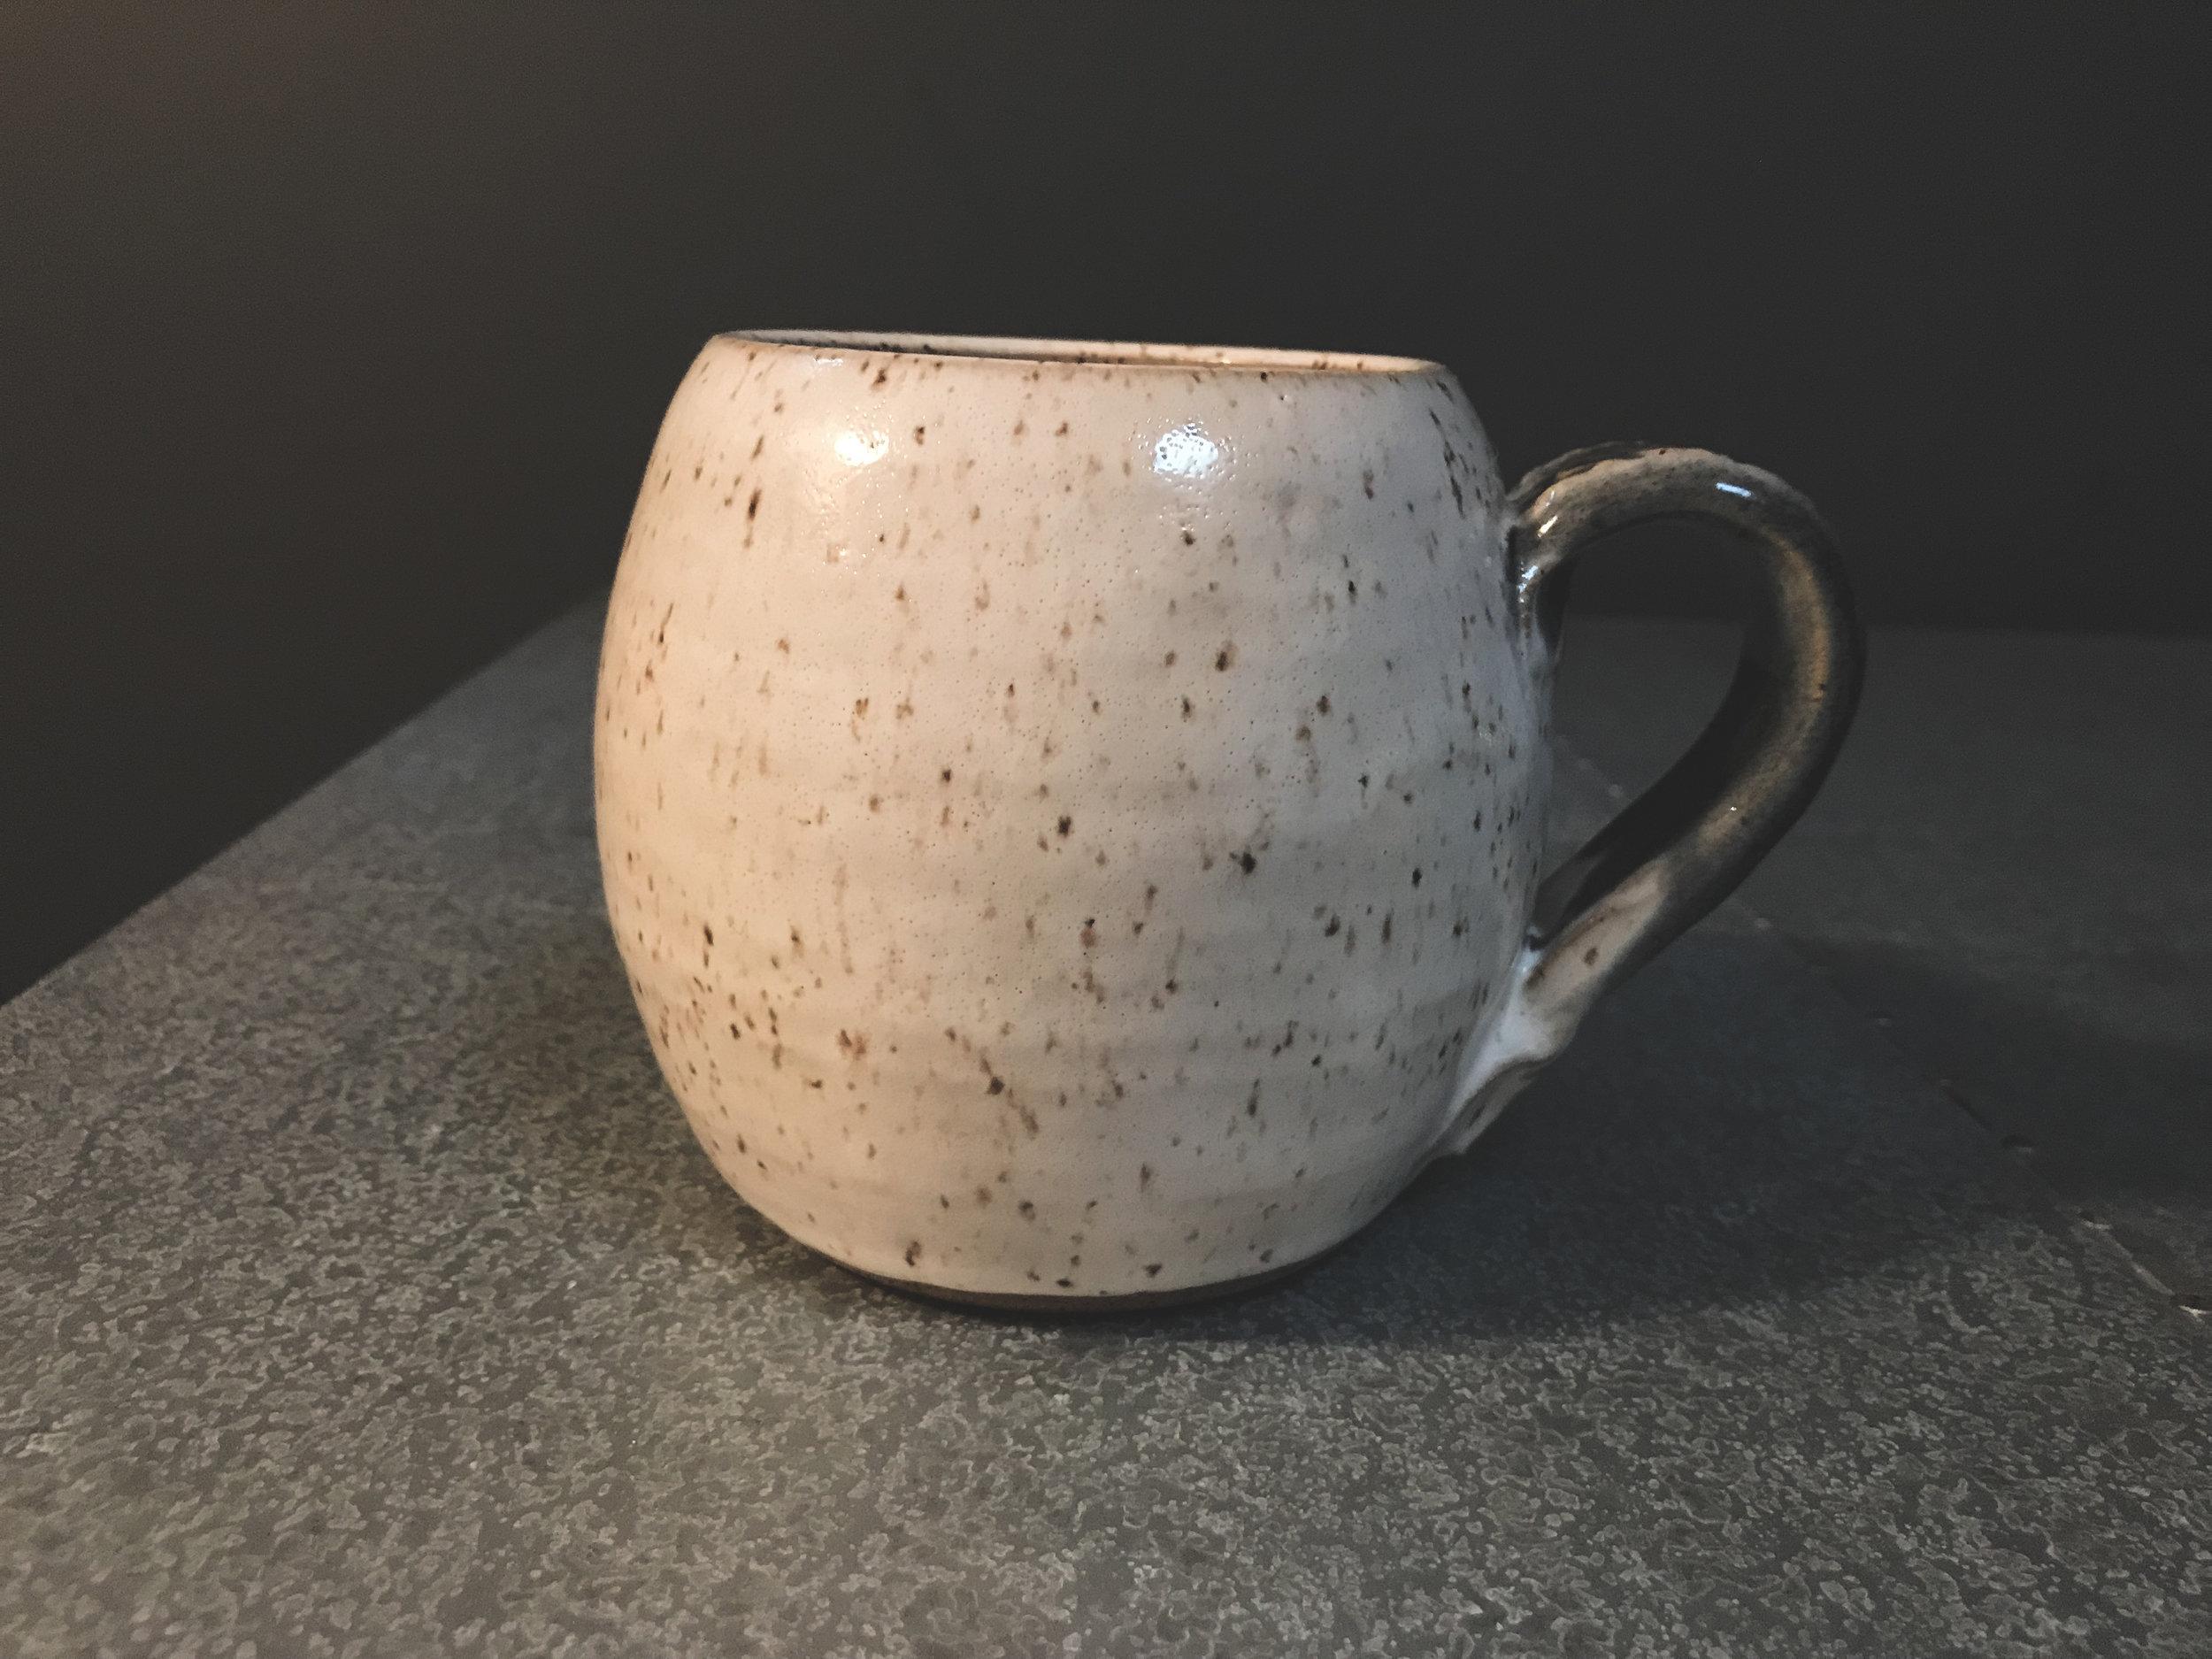 Charming Speckled Glaze Looks Ocean Handle Mugs Baleia Blu Ceramics Making Pottery Mug Handles Pottery Mugs Without Handles This I Like Shape furniture Pottery Mug Handles